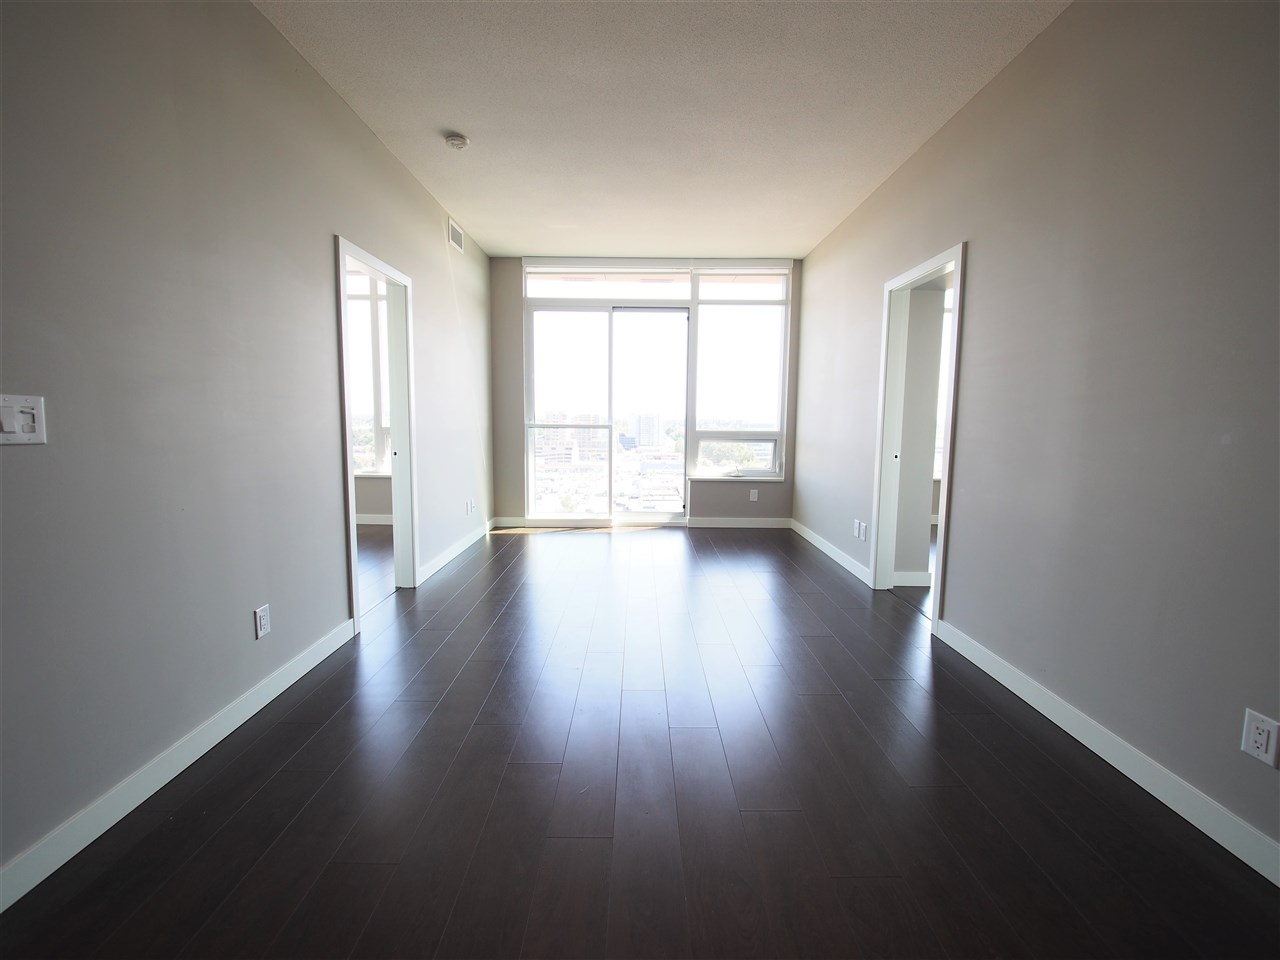 Condo Apartment at 1807 6288 NO 3 ROAD, Unit 1807, Richmond, British Columbia. Image 2